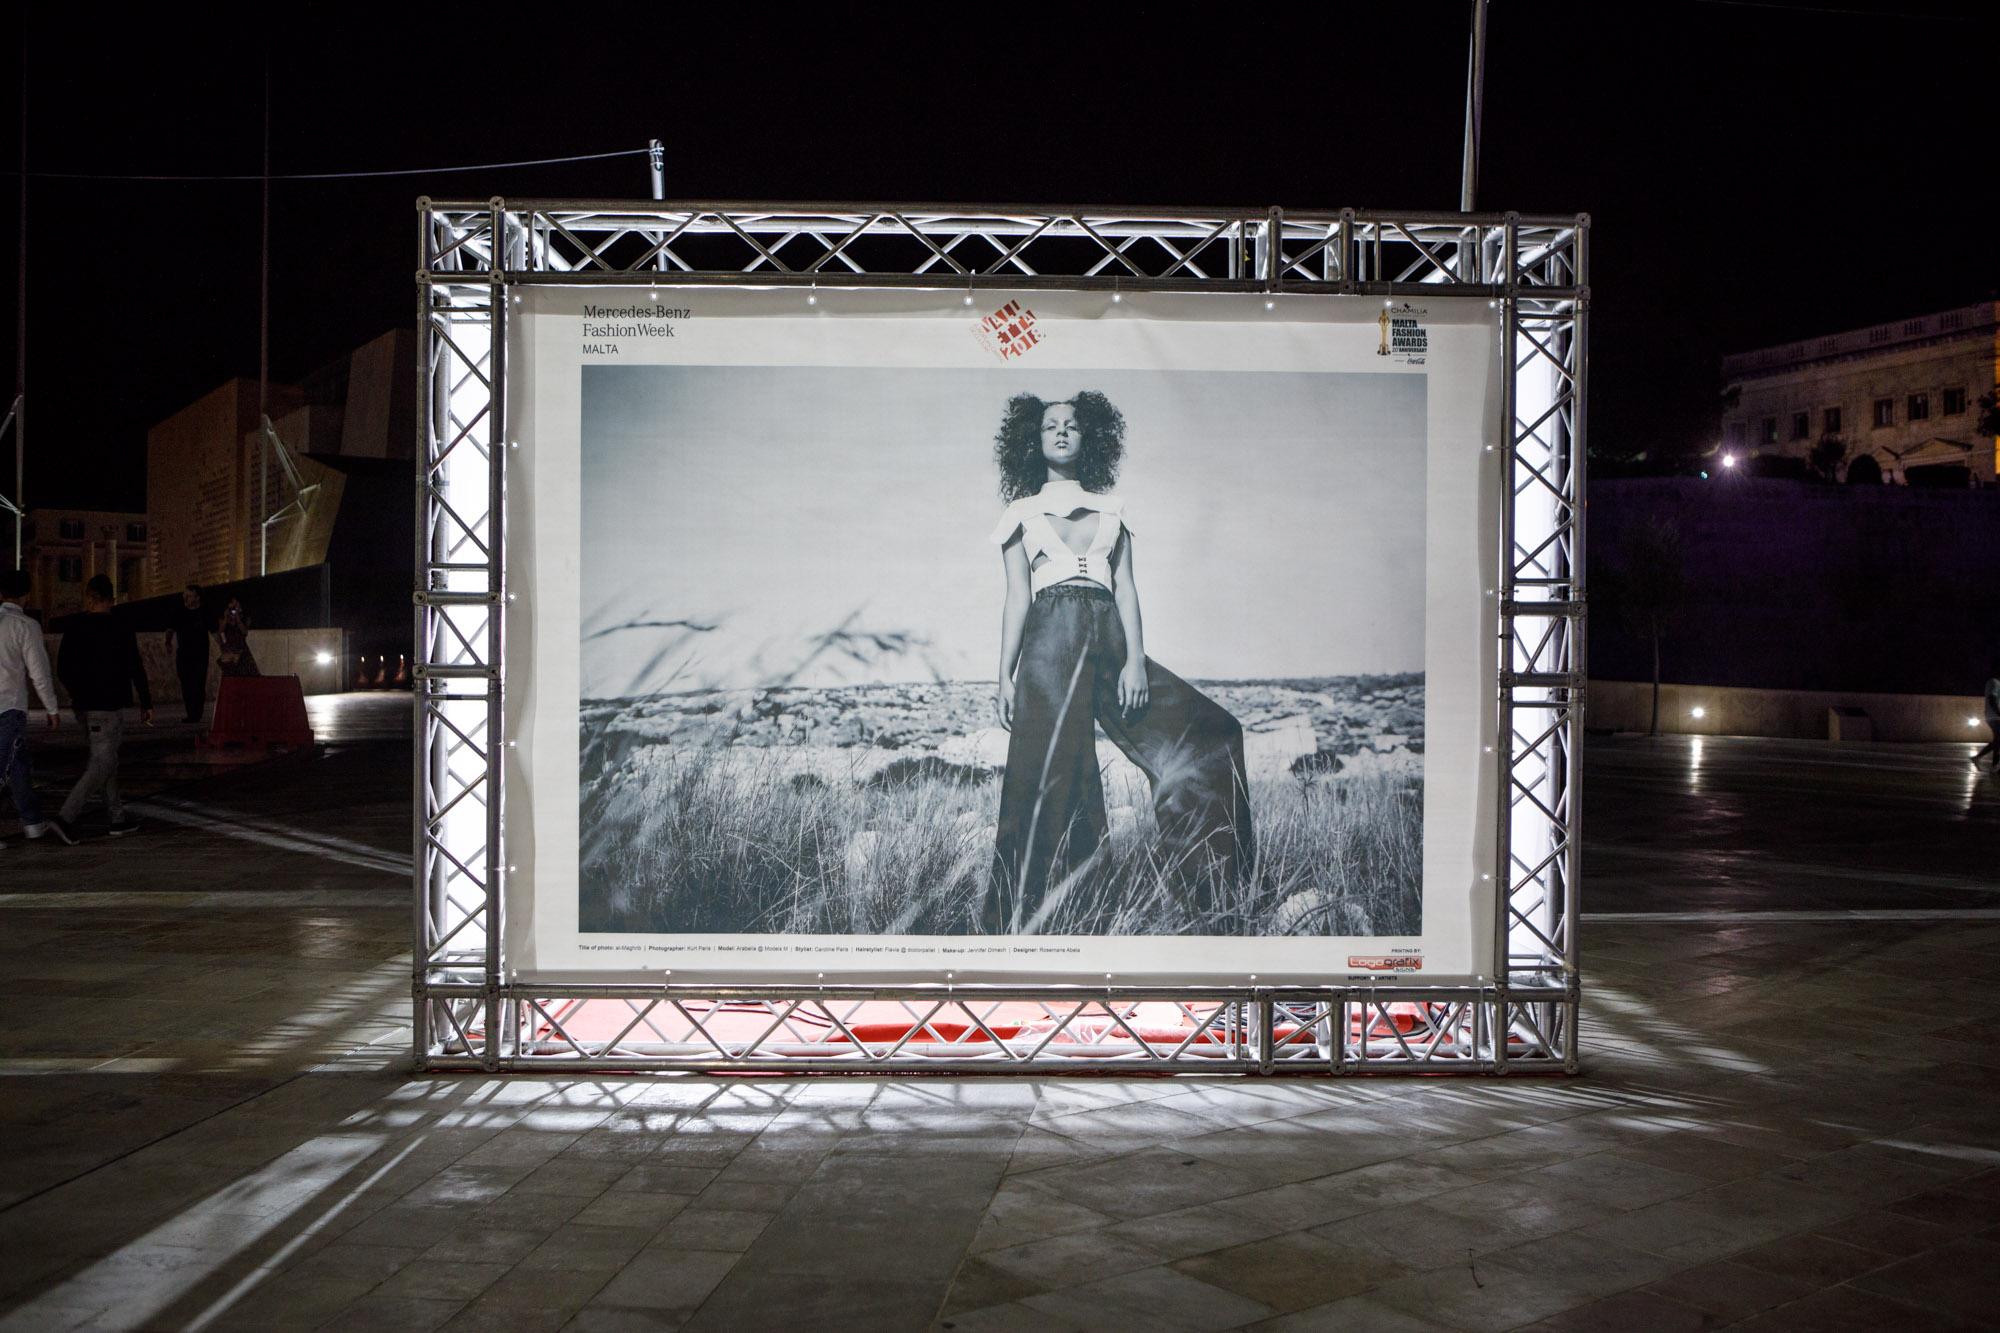 MFWA 2018 - Kurt Paris (https://www.kurtparis.com)